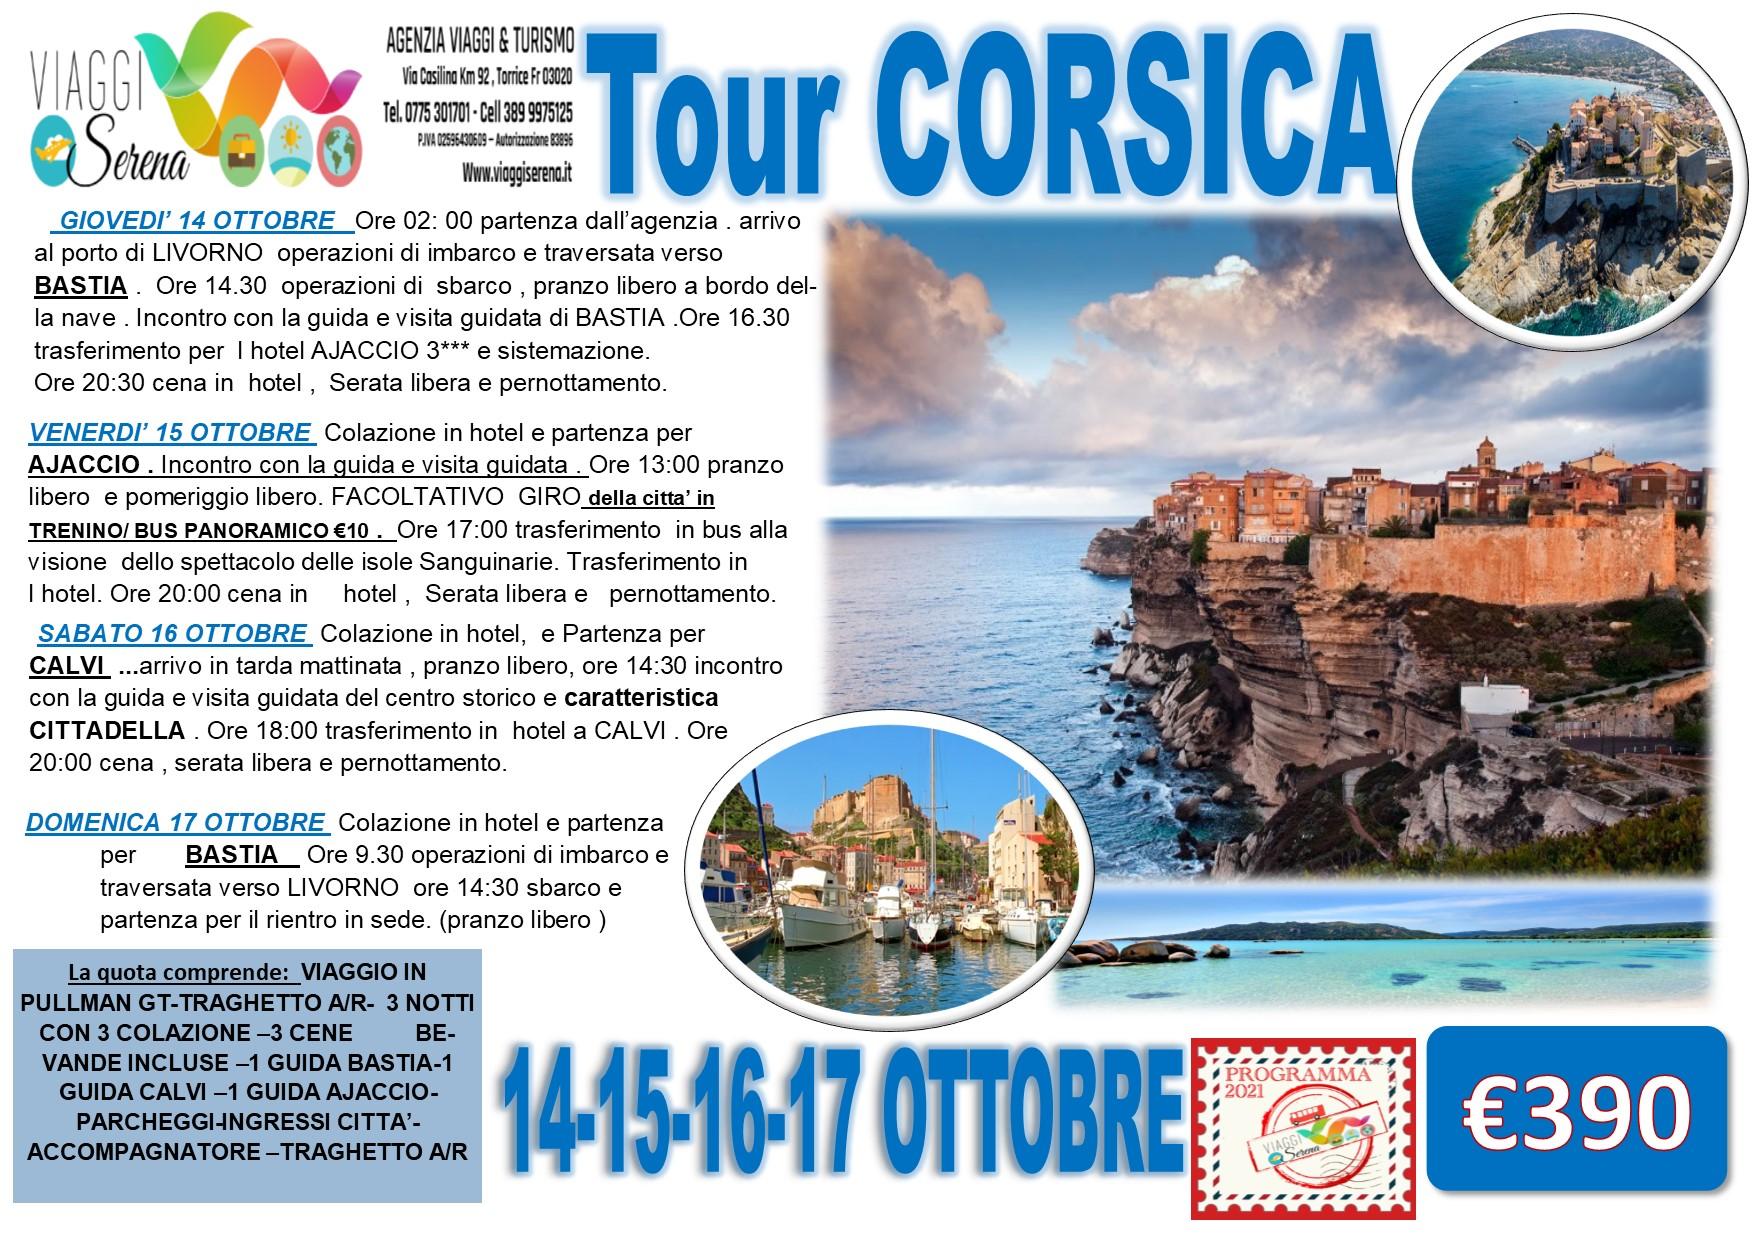 Viaggi di Gruppo: Tour CORSICA, Ajaccio, Bastia & Calvi  14-15-16-17 Ottobre  €390,00